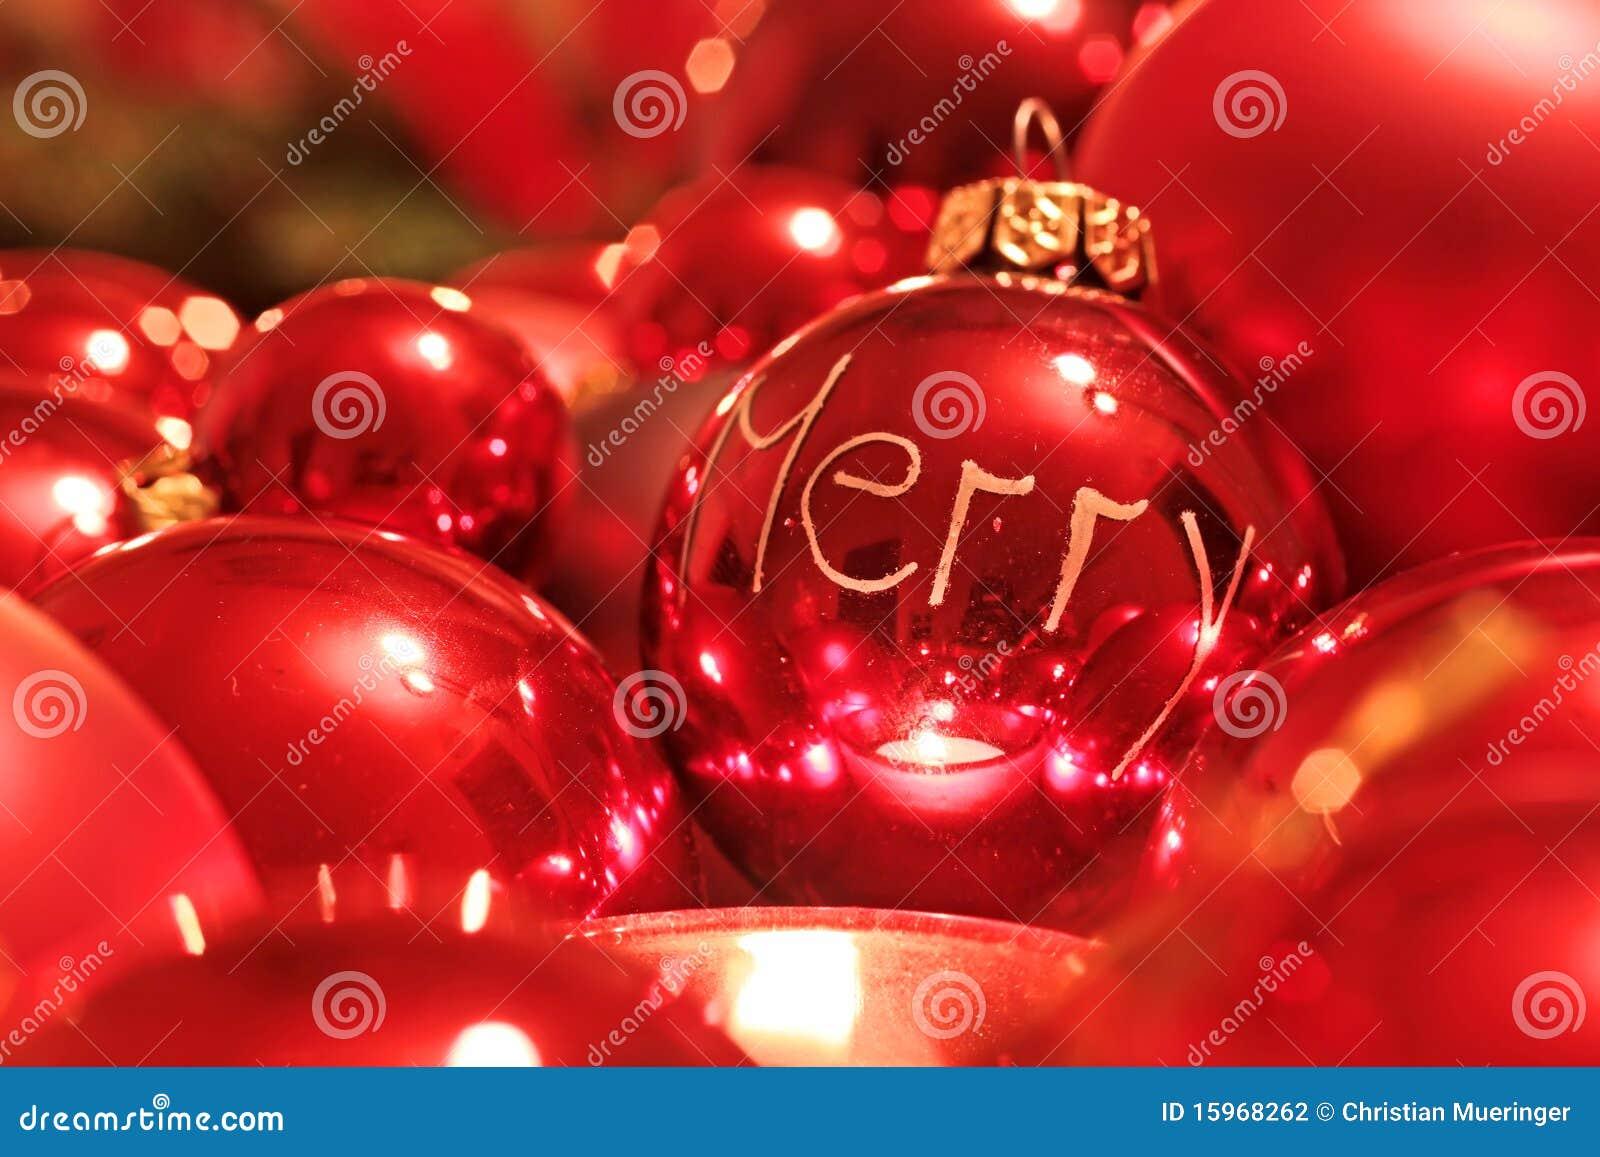 rote weihnachtskugeln stockfotografie bild 15968262. Black Bedroom Furniture Sets. Home Design Ideas